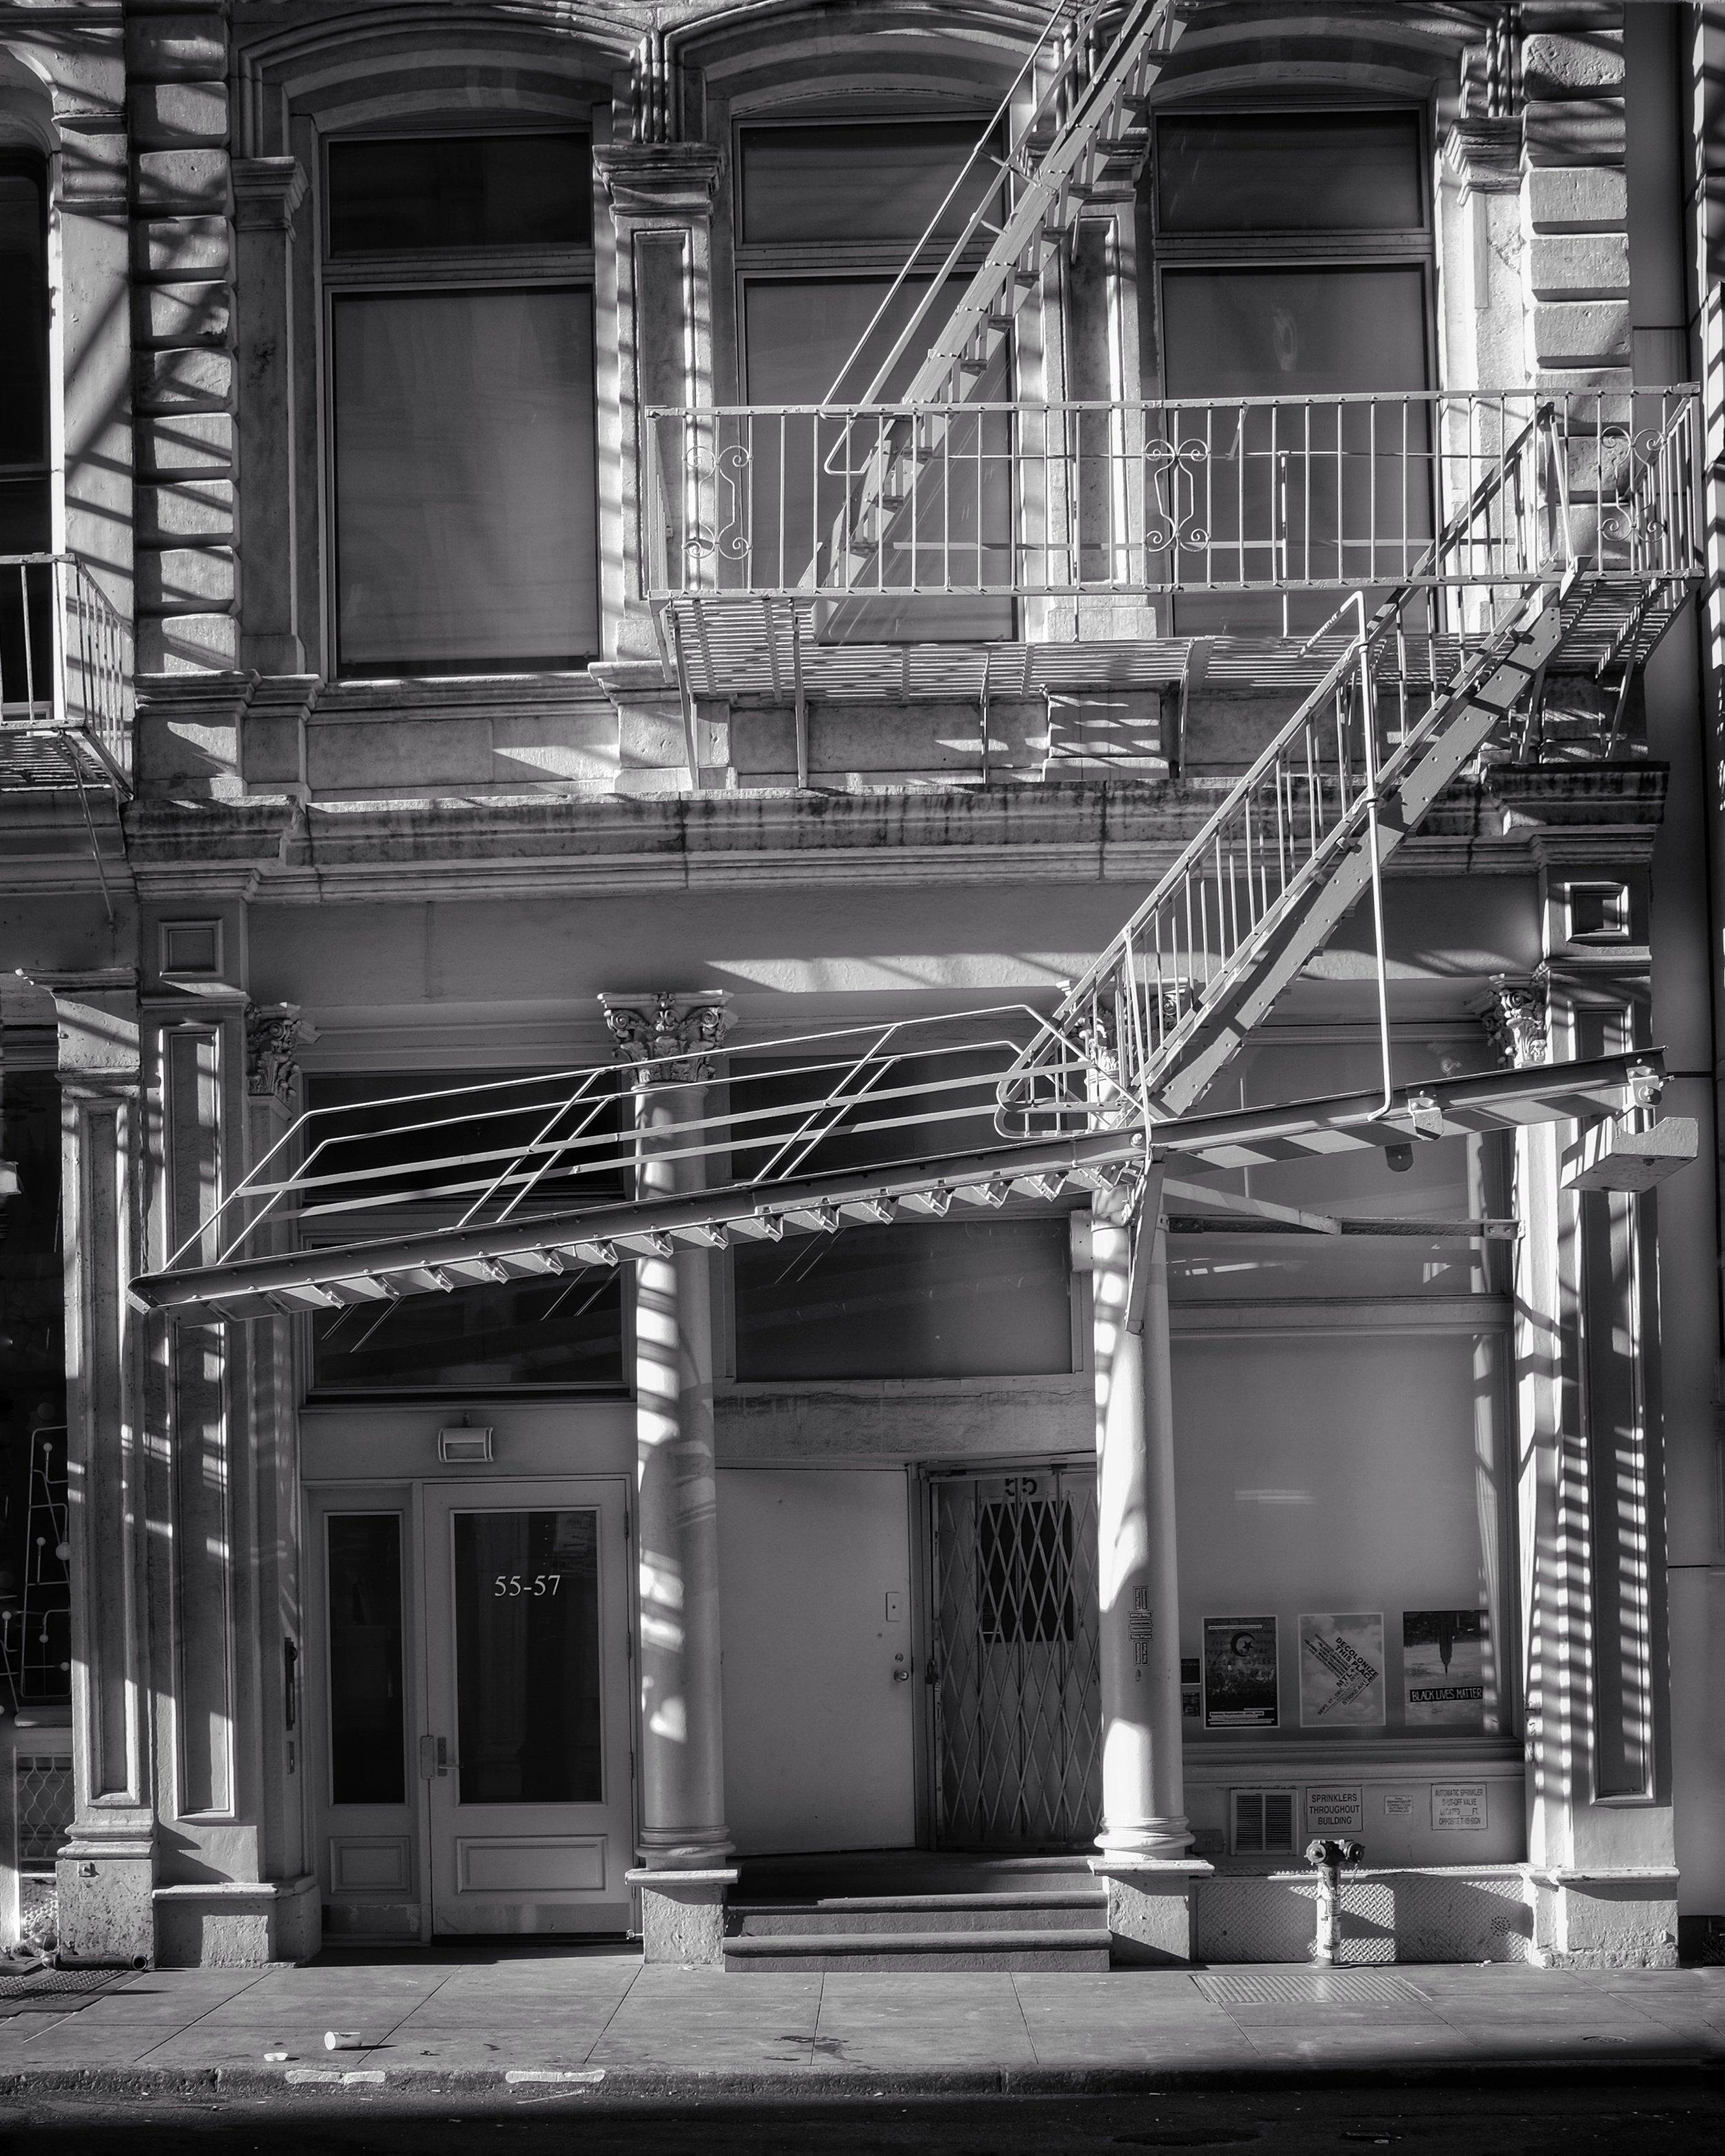 Walker Street. TriBeCa. New York City. 2016.